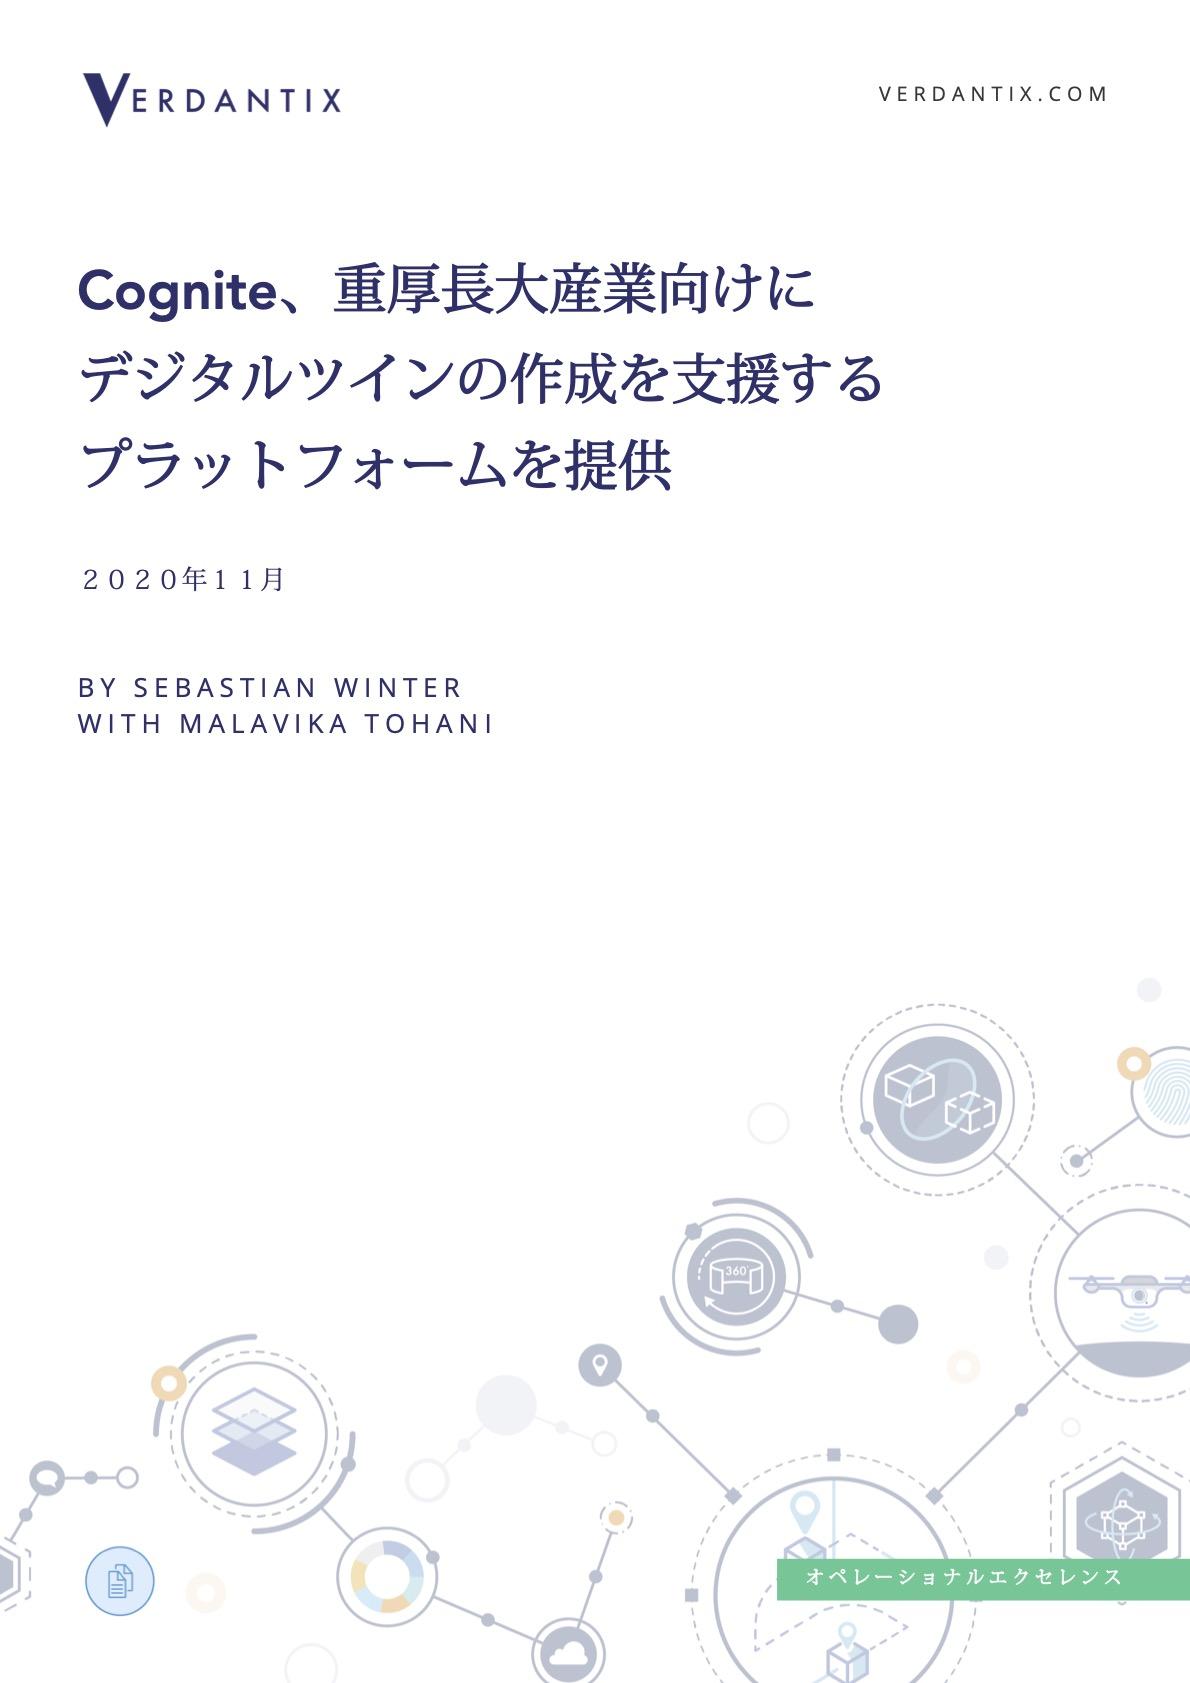 Japan_Verdantix_research